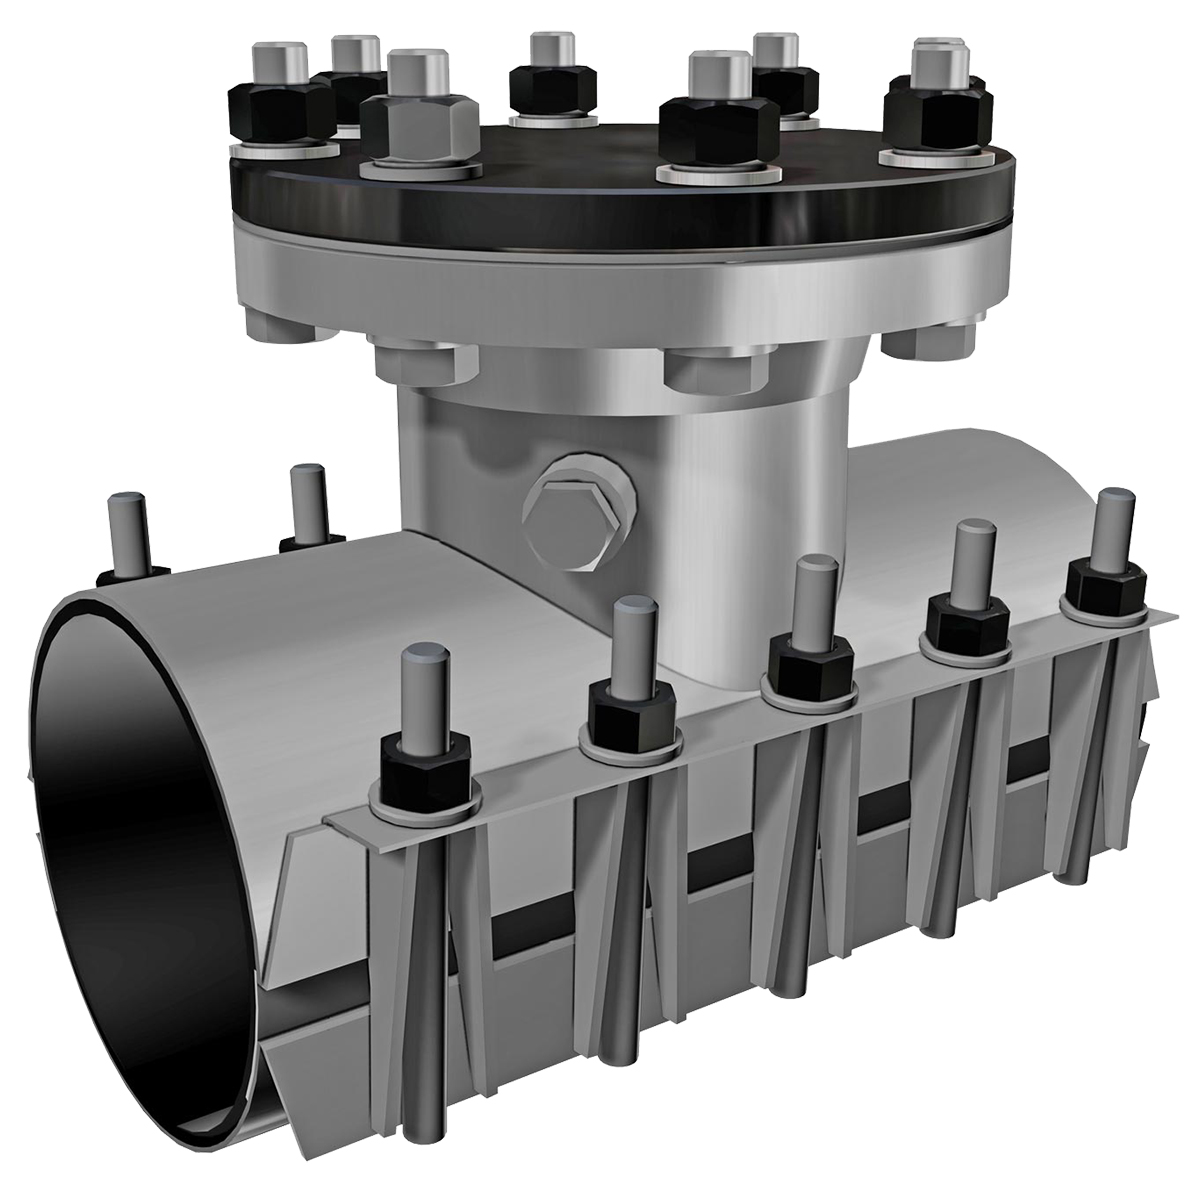 SST-X - Stainless steel line stop sleeveNominal Sizes4 - 12 inchesWorking Pressure4